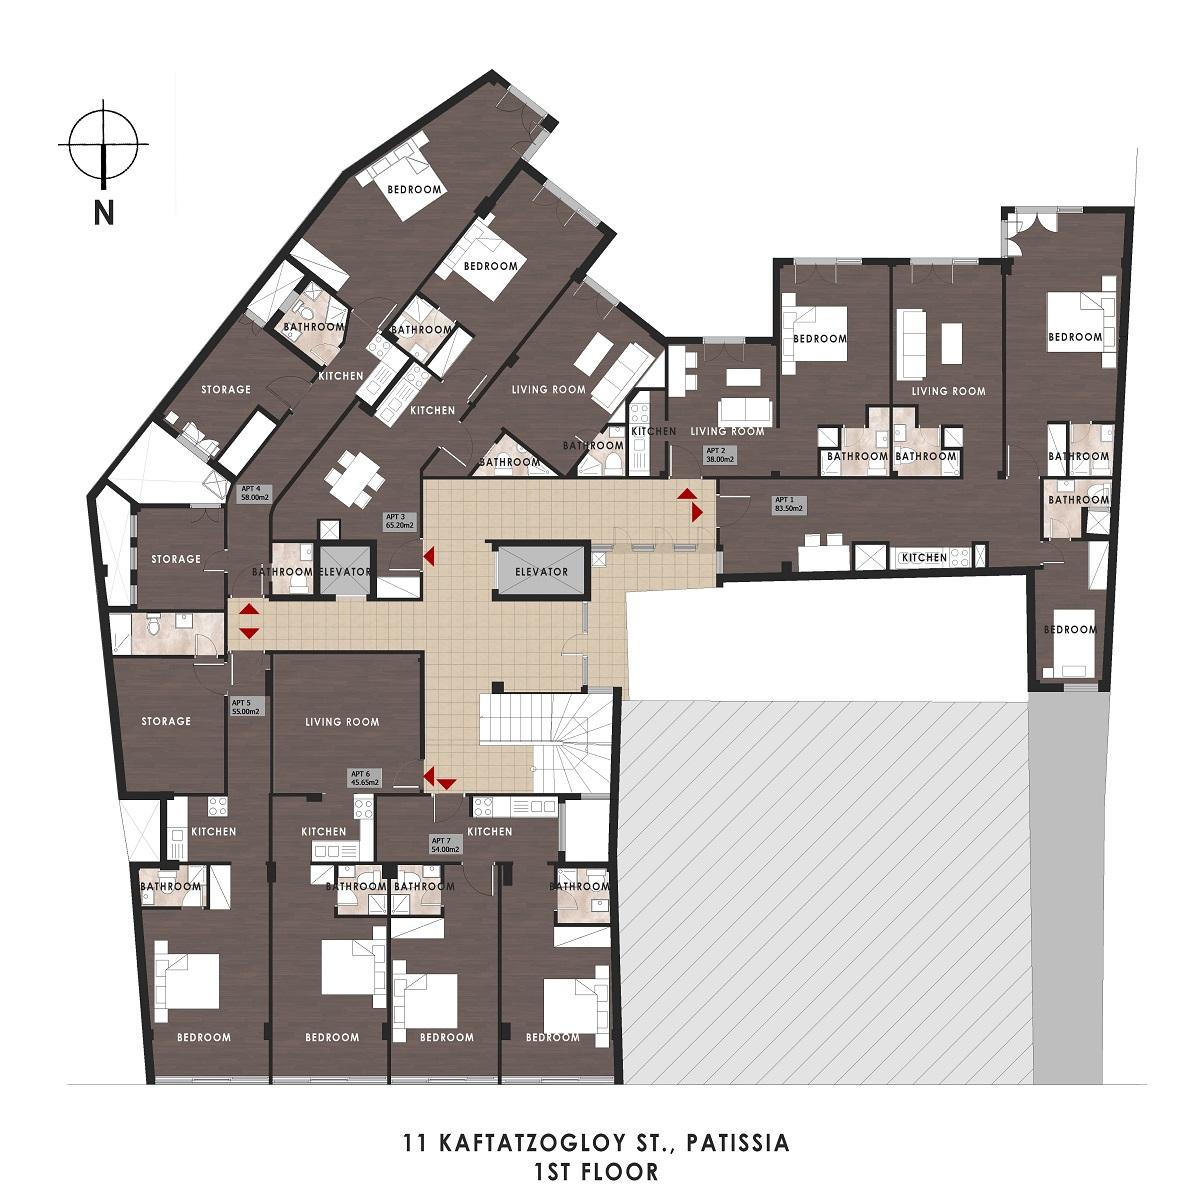 Kaftantzoglou 11 1st floor plan